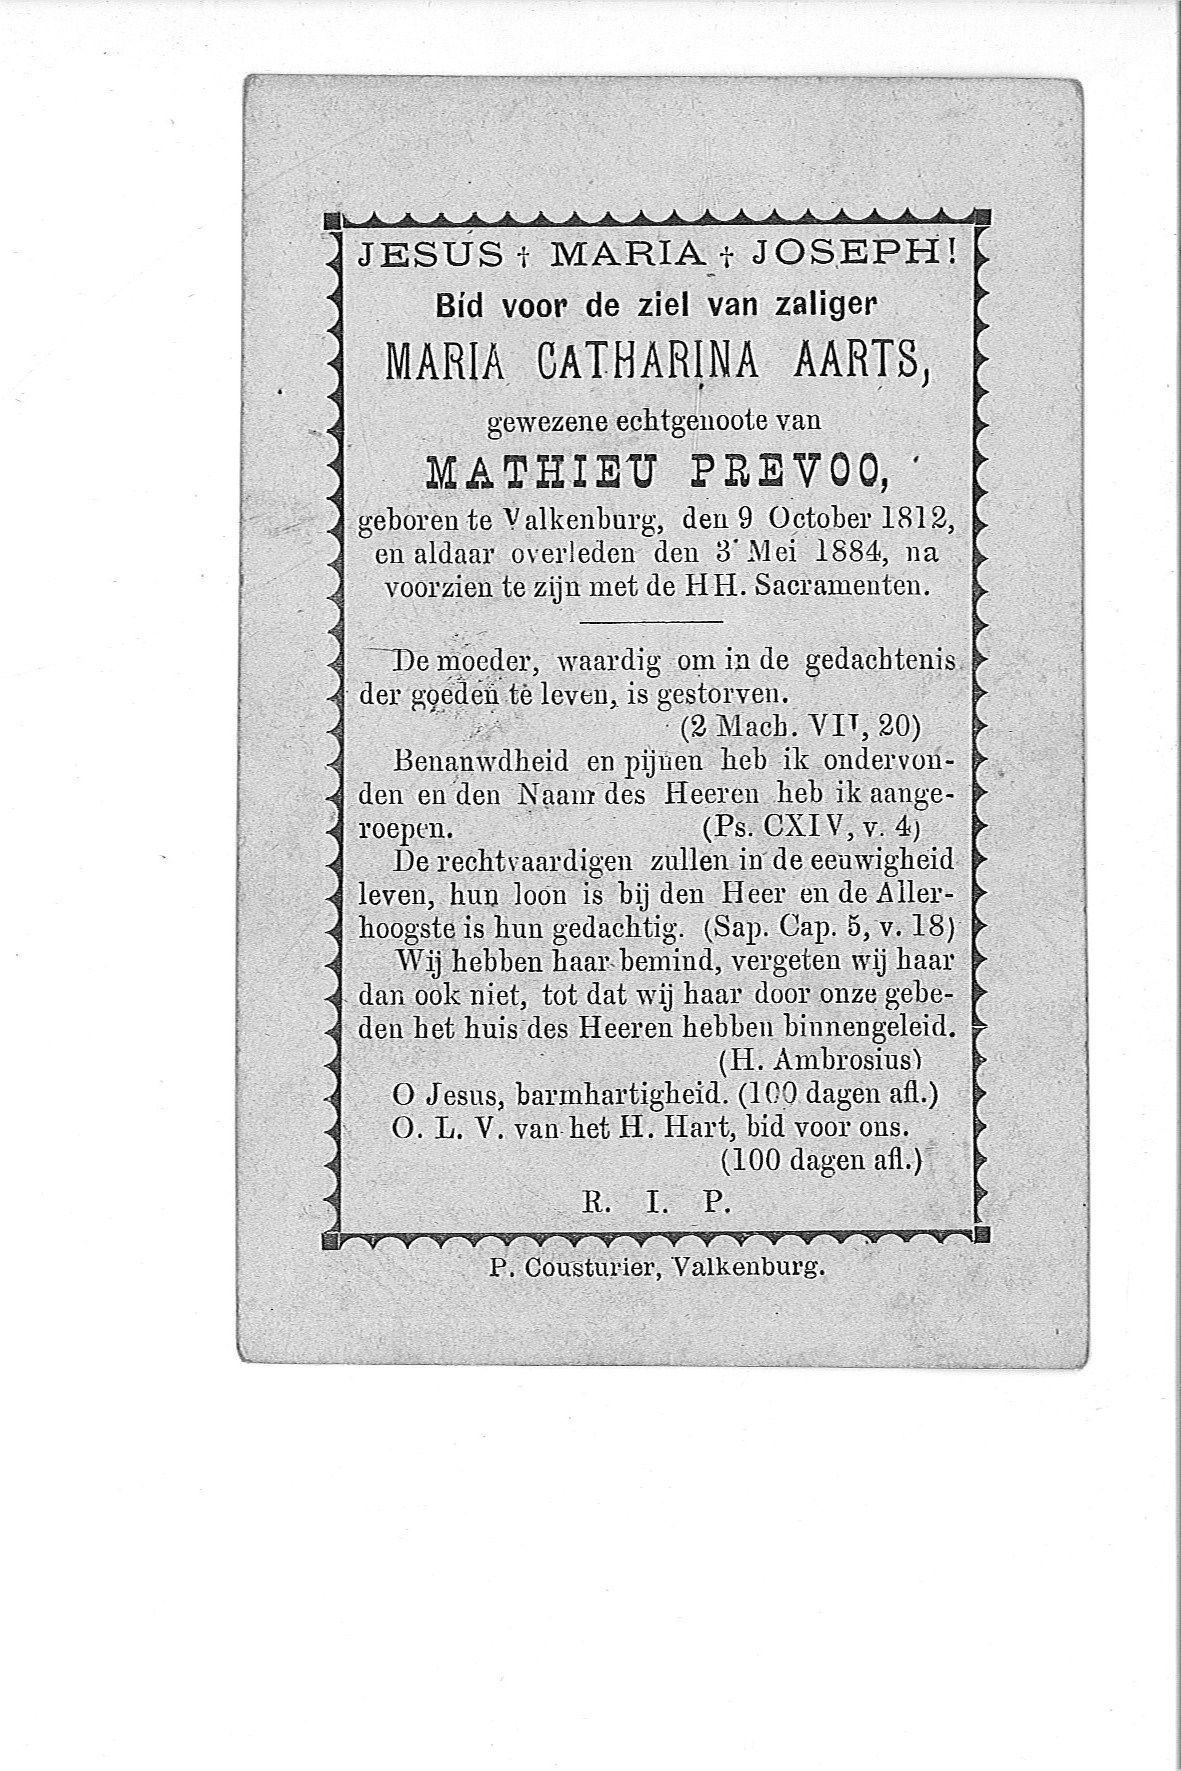 maria-catharina(1884)20090109092003_00001.jpg